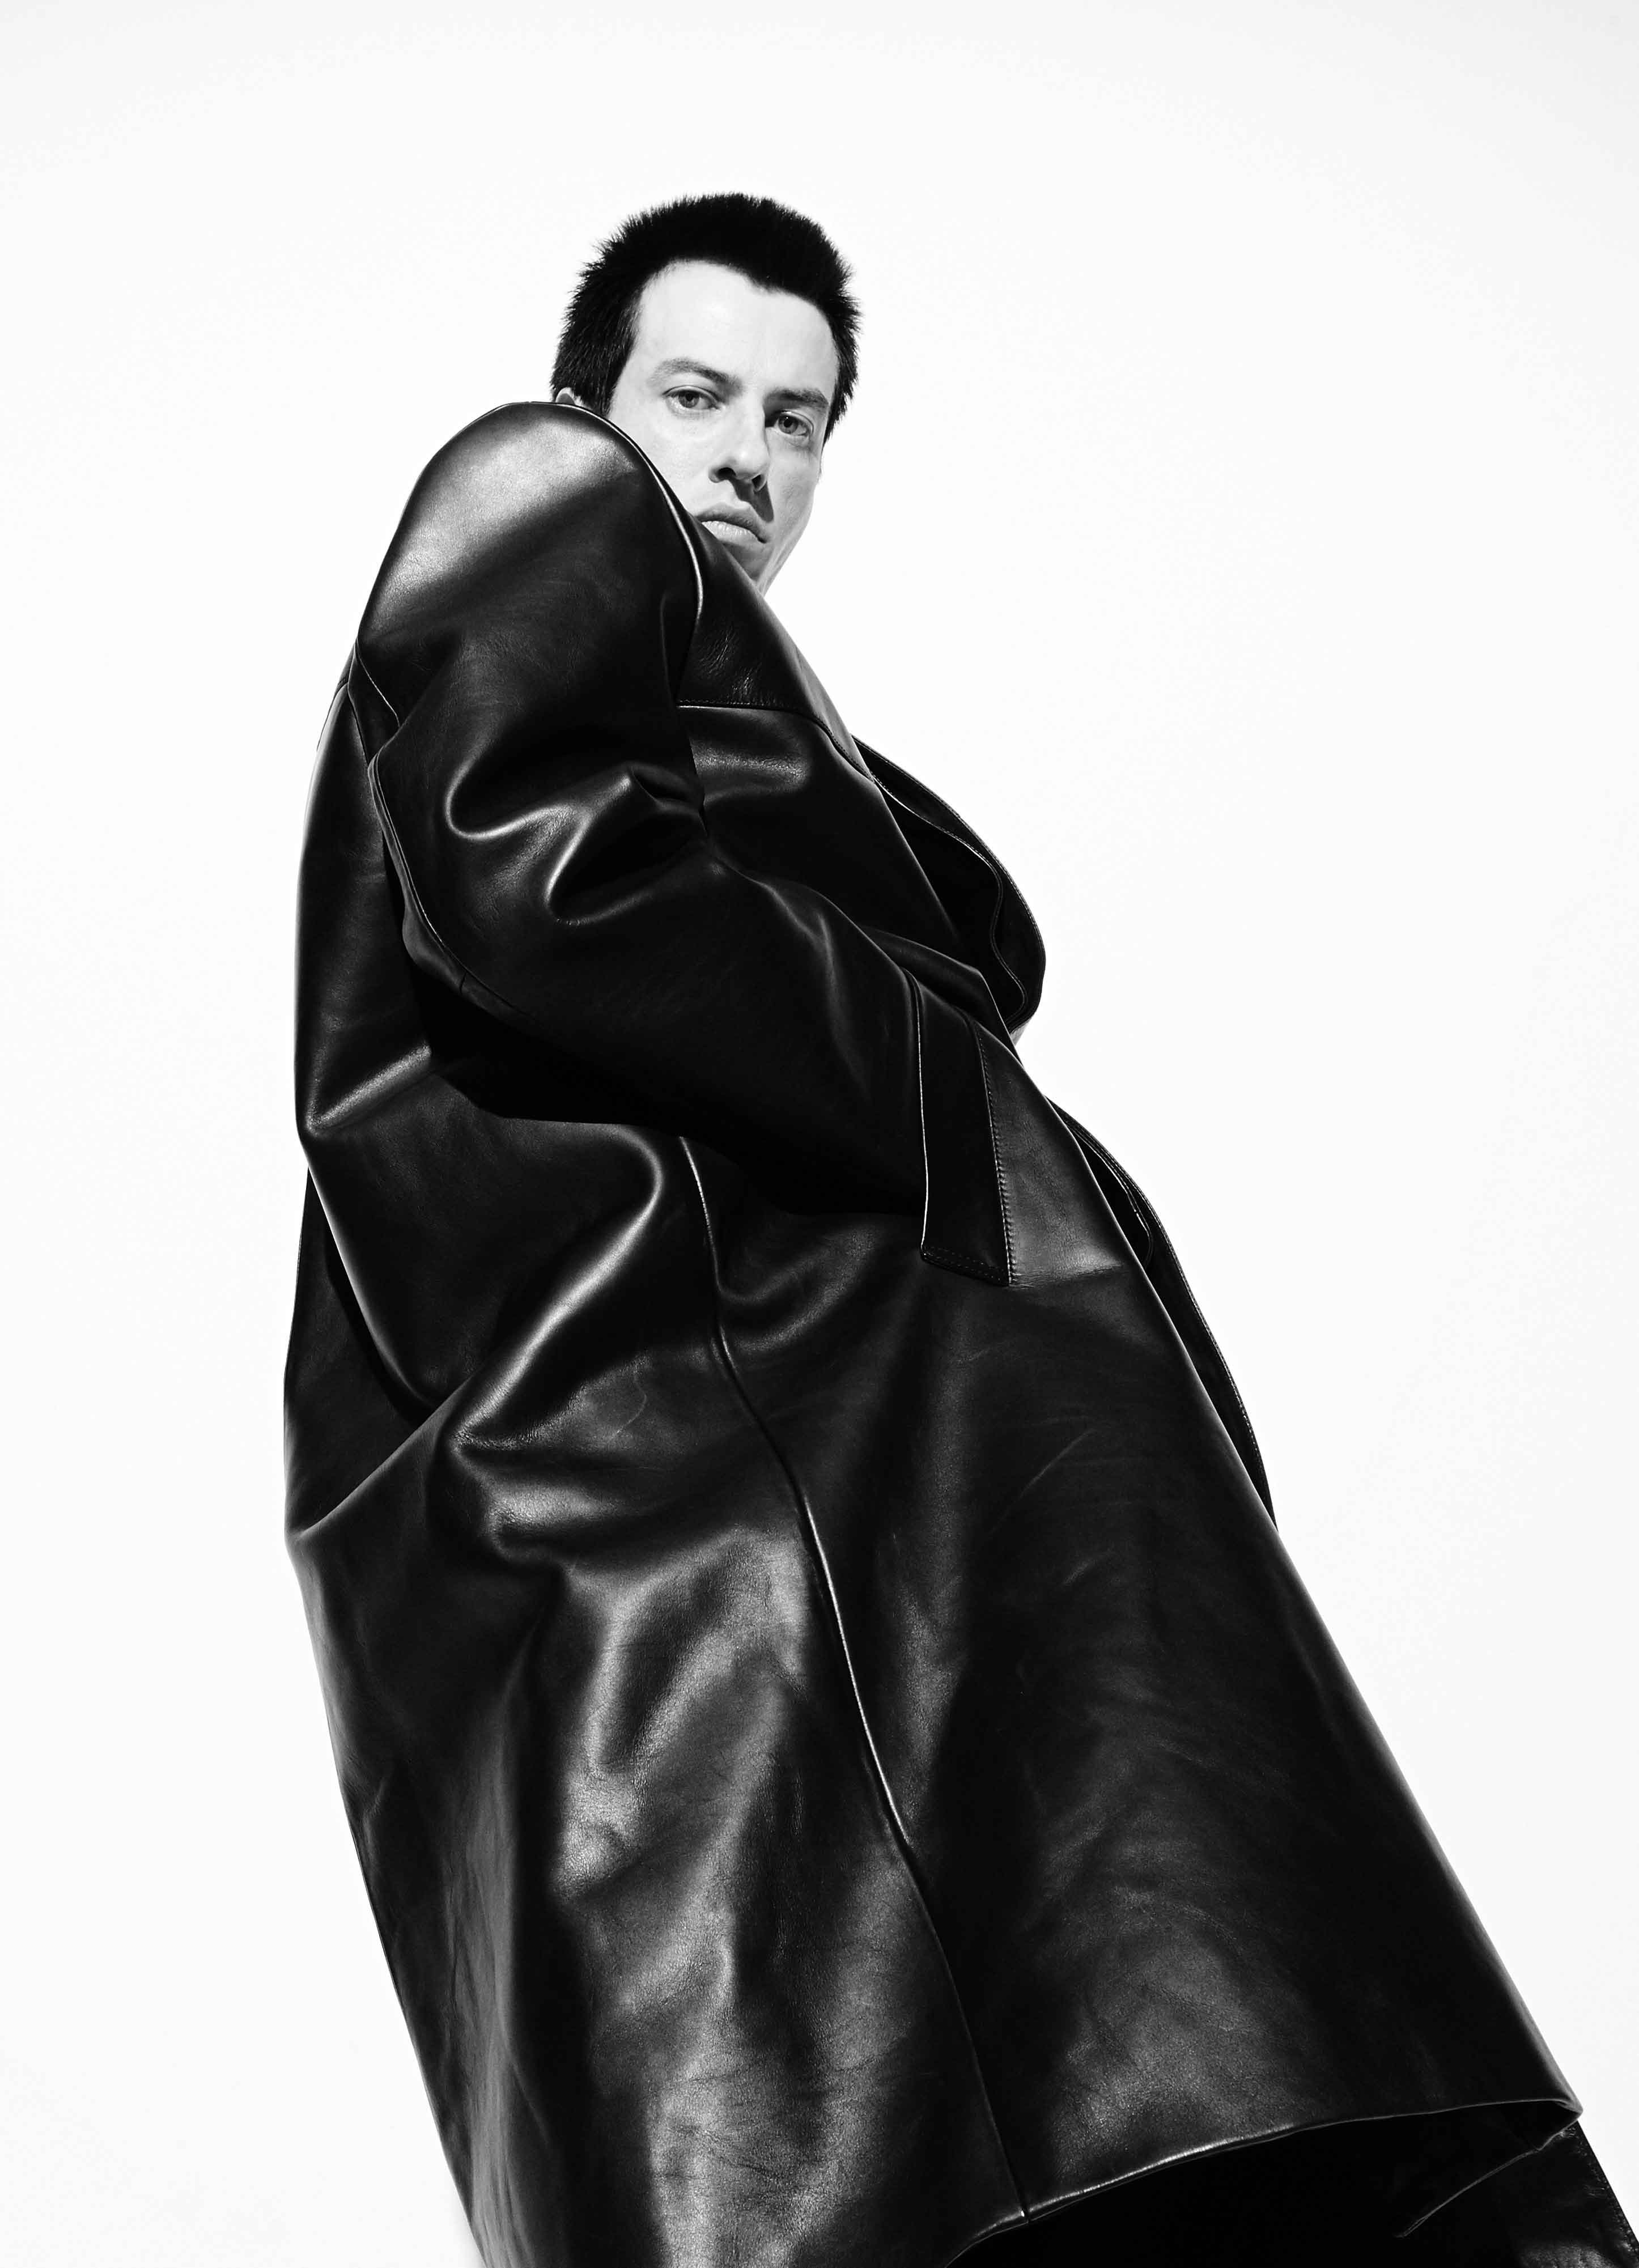 "Office Magazine Issue 05 ""The Surly Bonds"" | Alessio Bolzoni | Office Magazine | Hector Castro | Numerique Retouch Photo Retouching Studio"